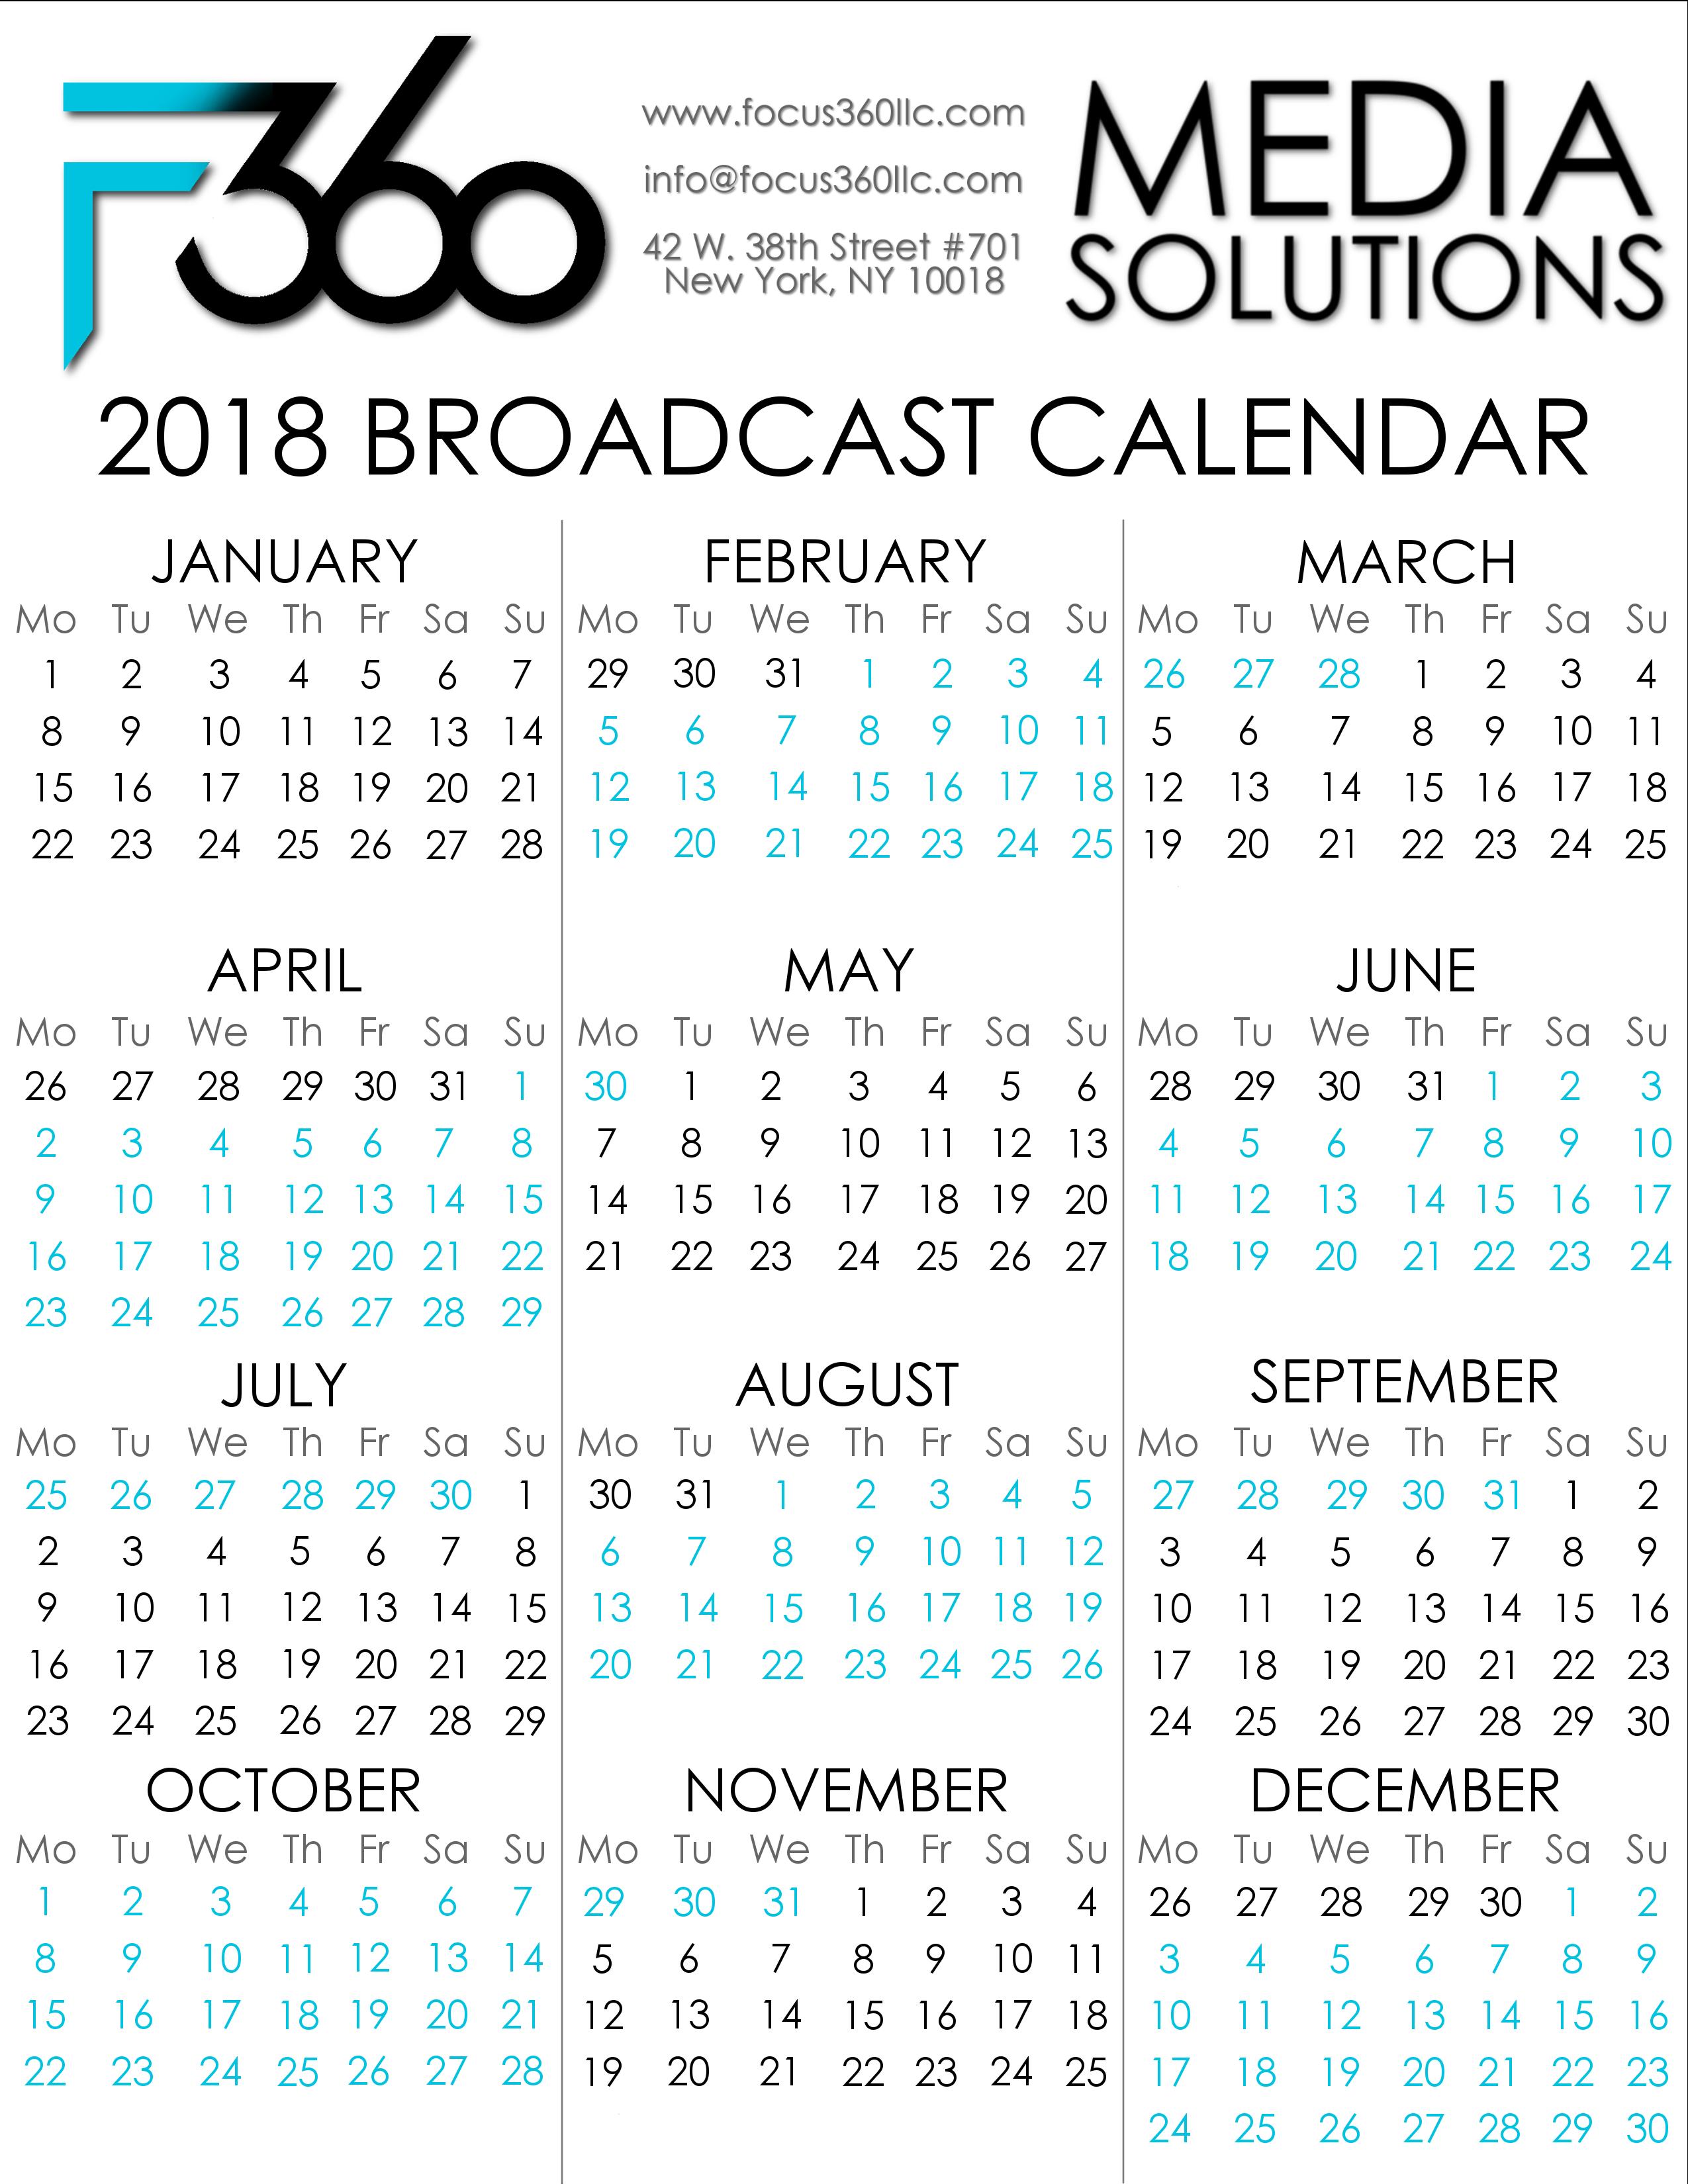 2018 Focus 360 Broadcast Calendar | focus360